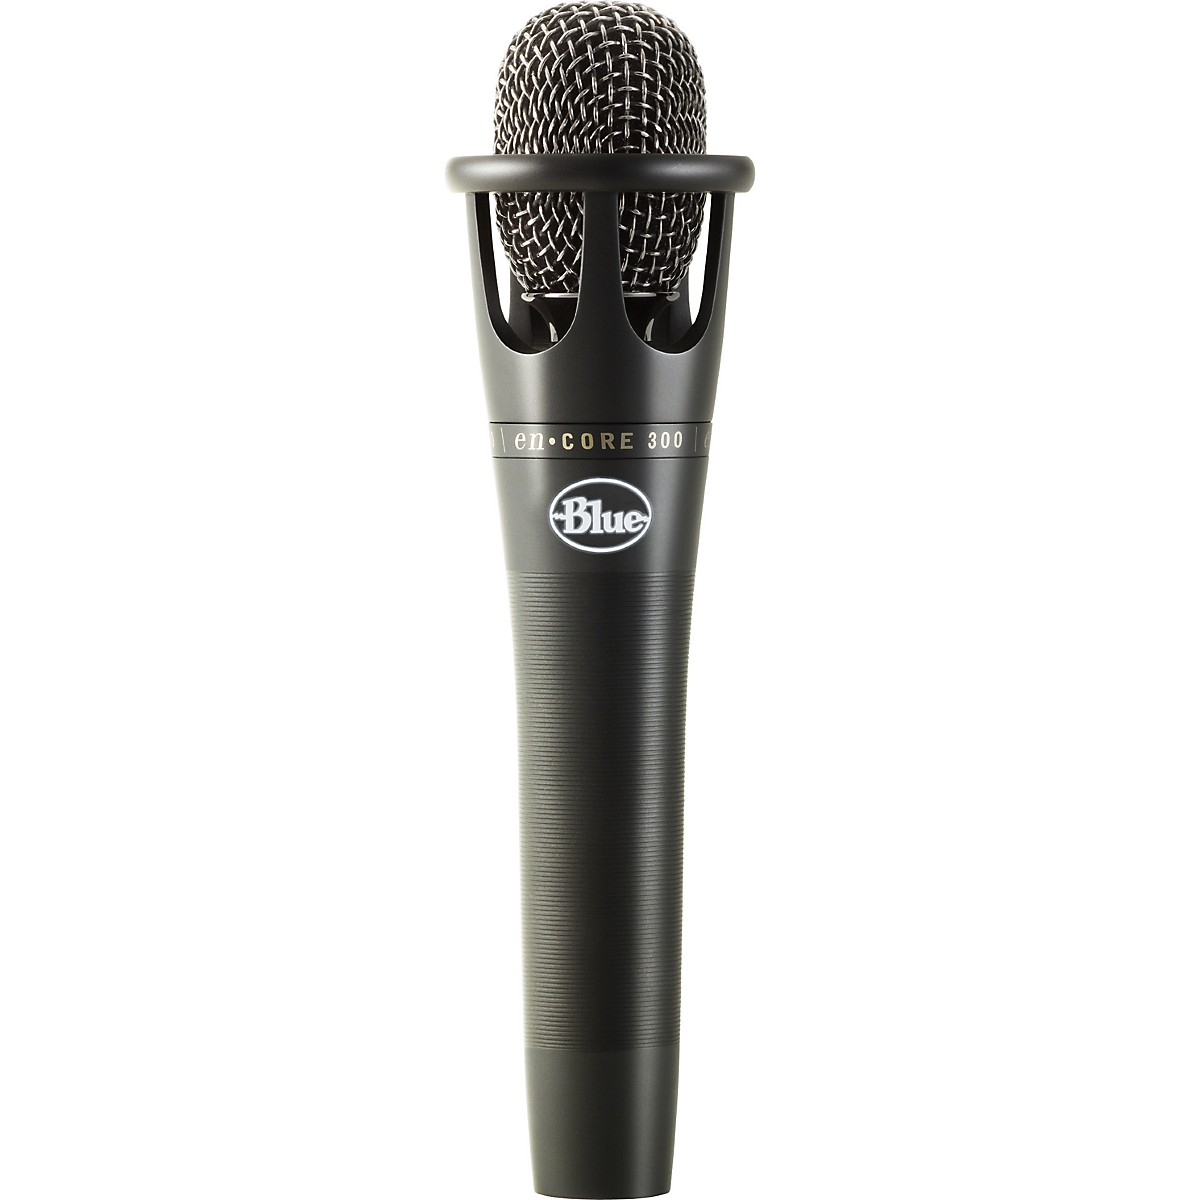 Blue enCORE 300 Condenser Live Vocal Microphone